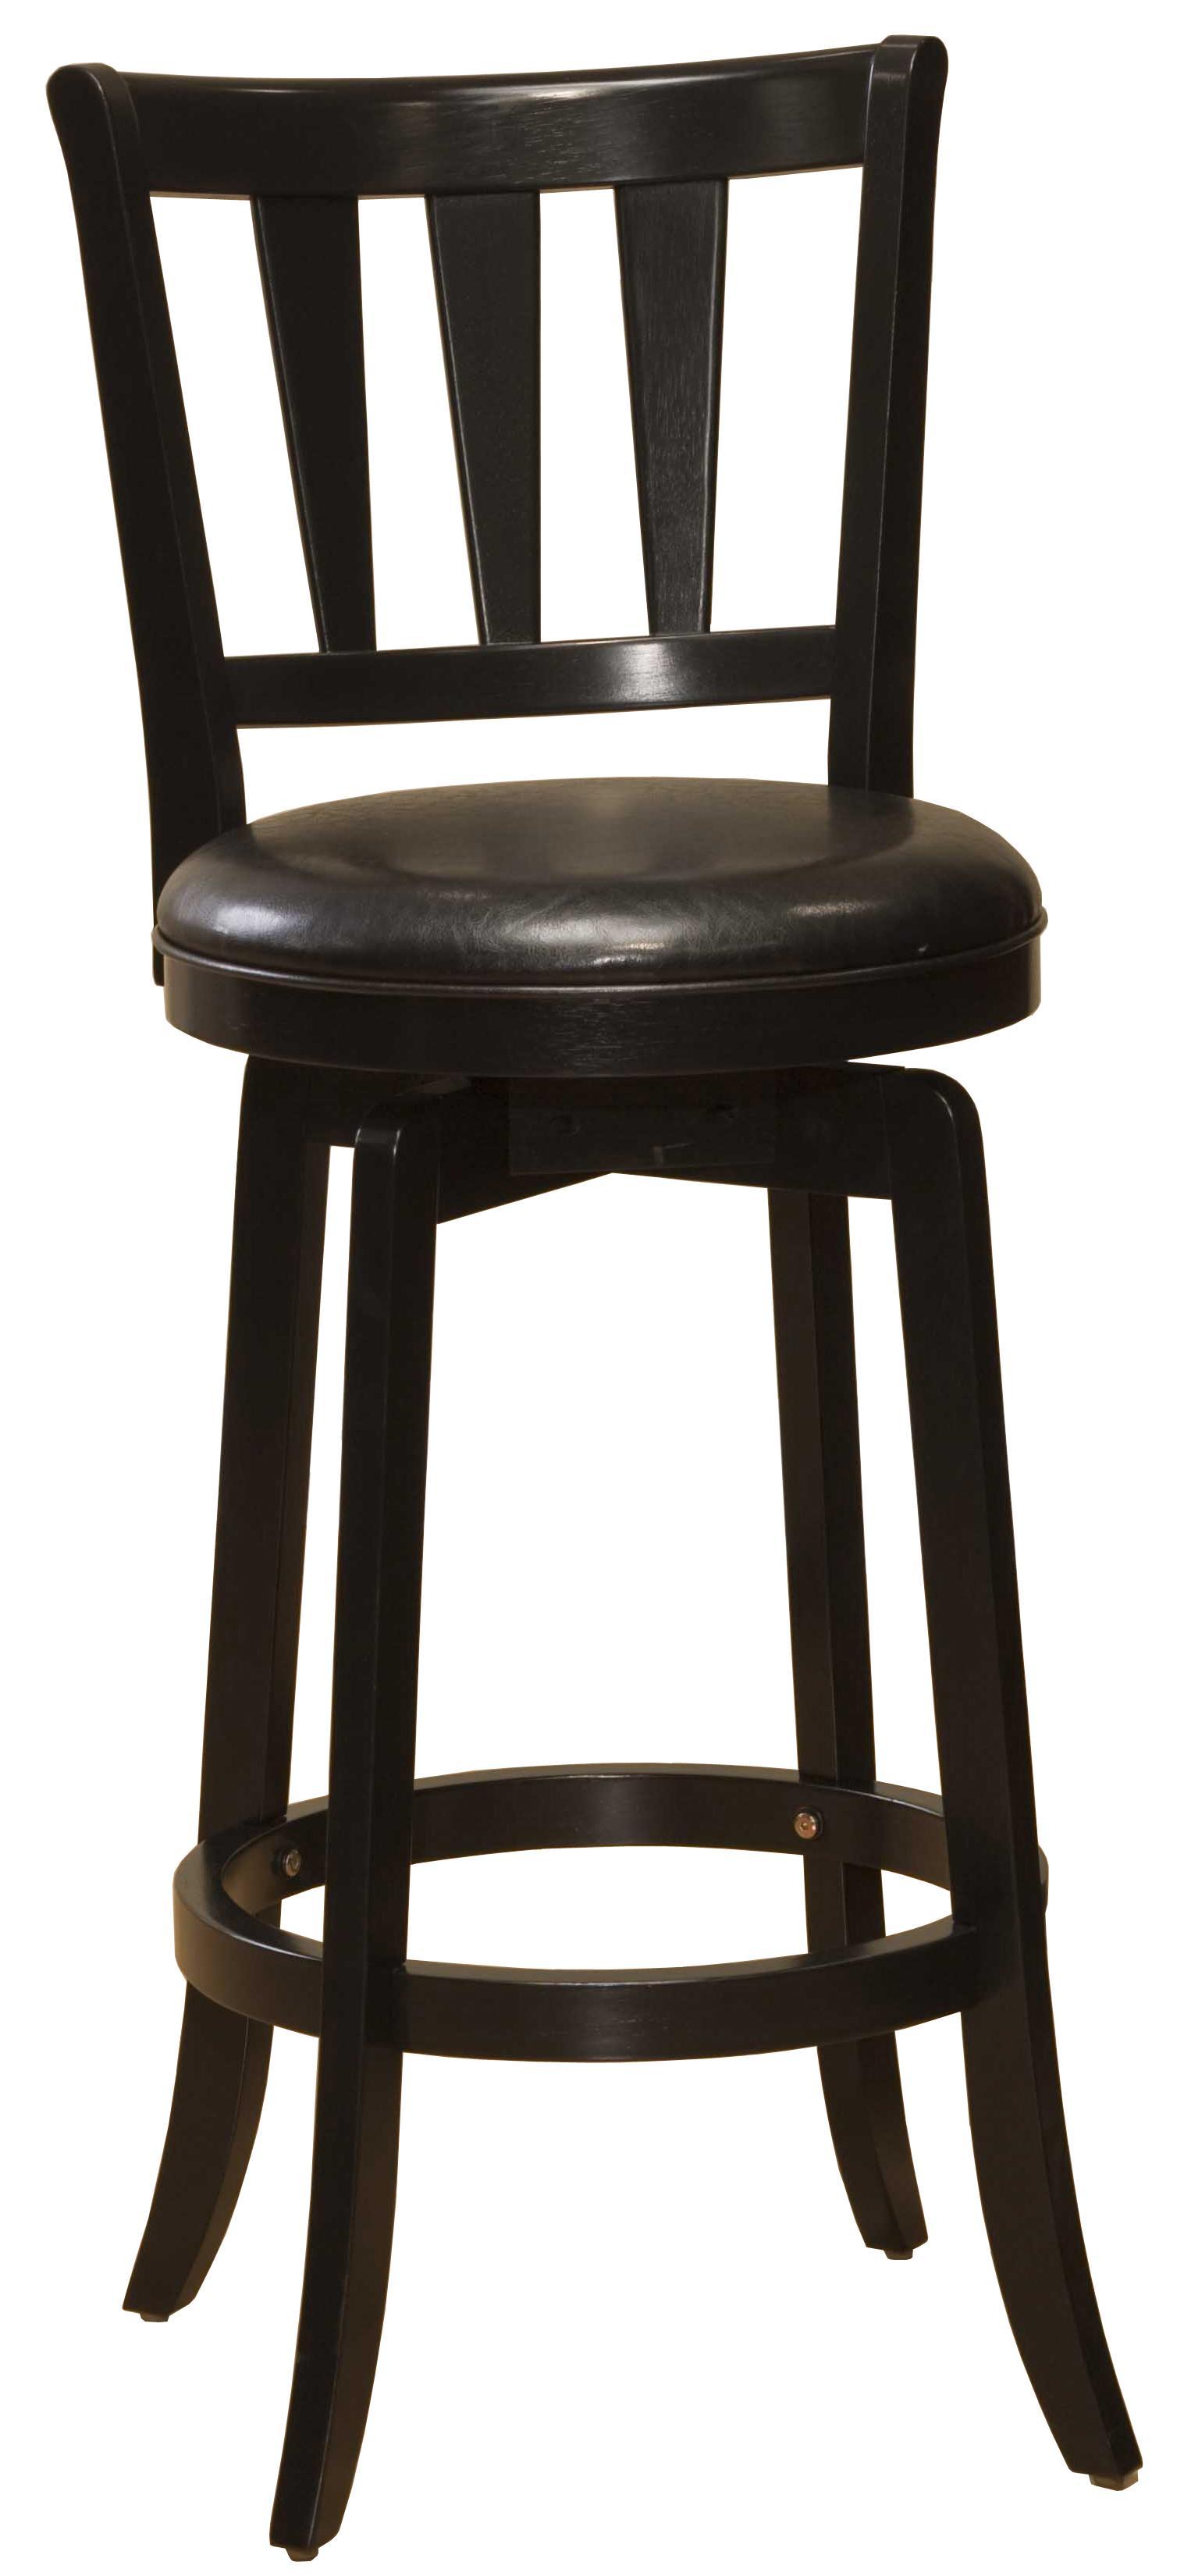 "Wood Stools 30"" Bar Height Presque Isle Swivel Bar Stool at Ruby Gordon Home"